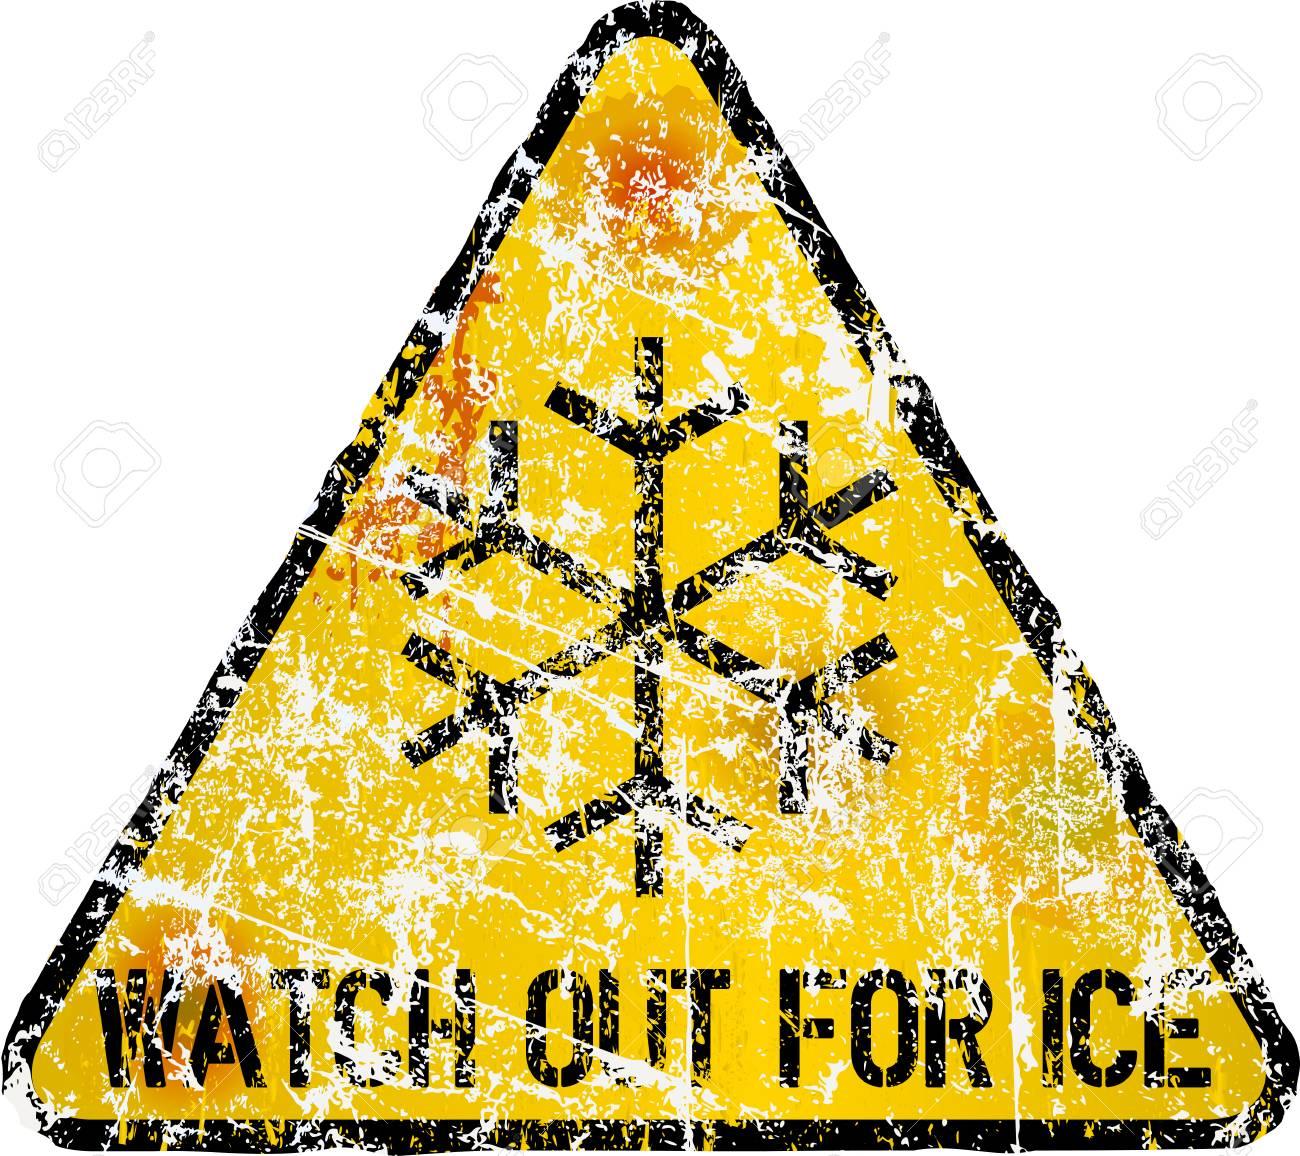 48032723-ice-warning-sign-vector-illustration-fictional-artwork.jpg